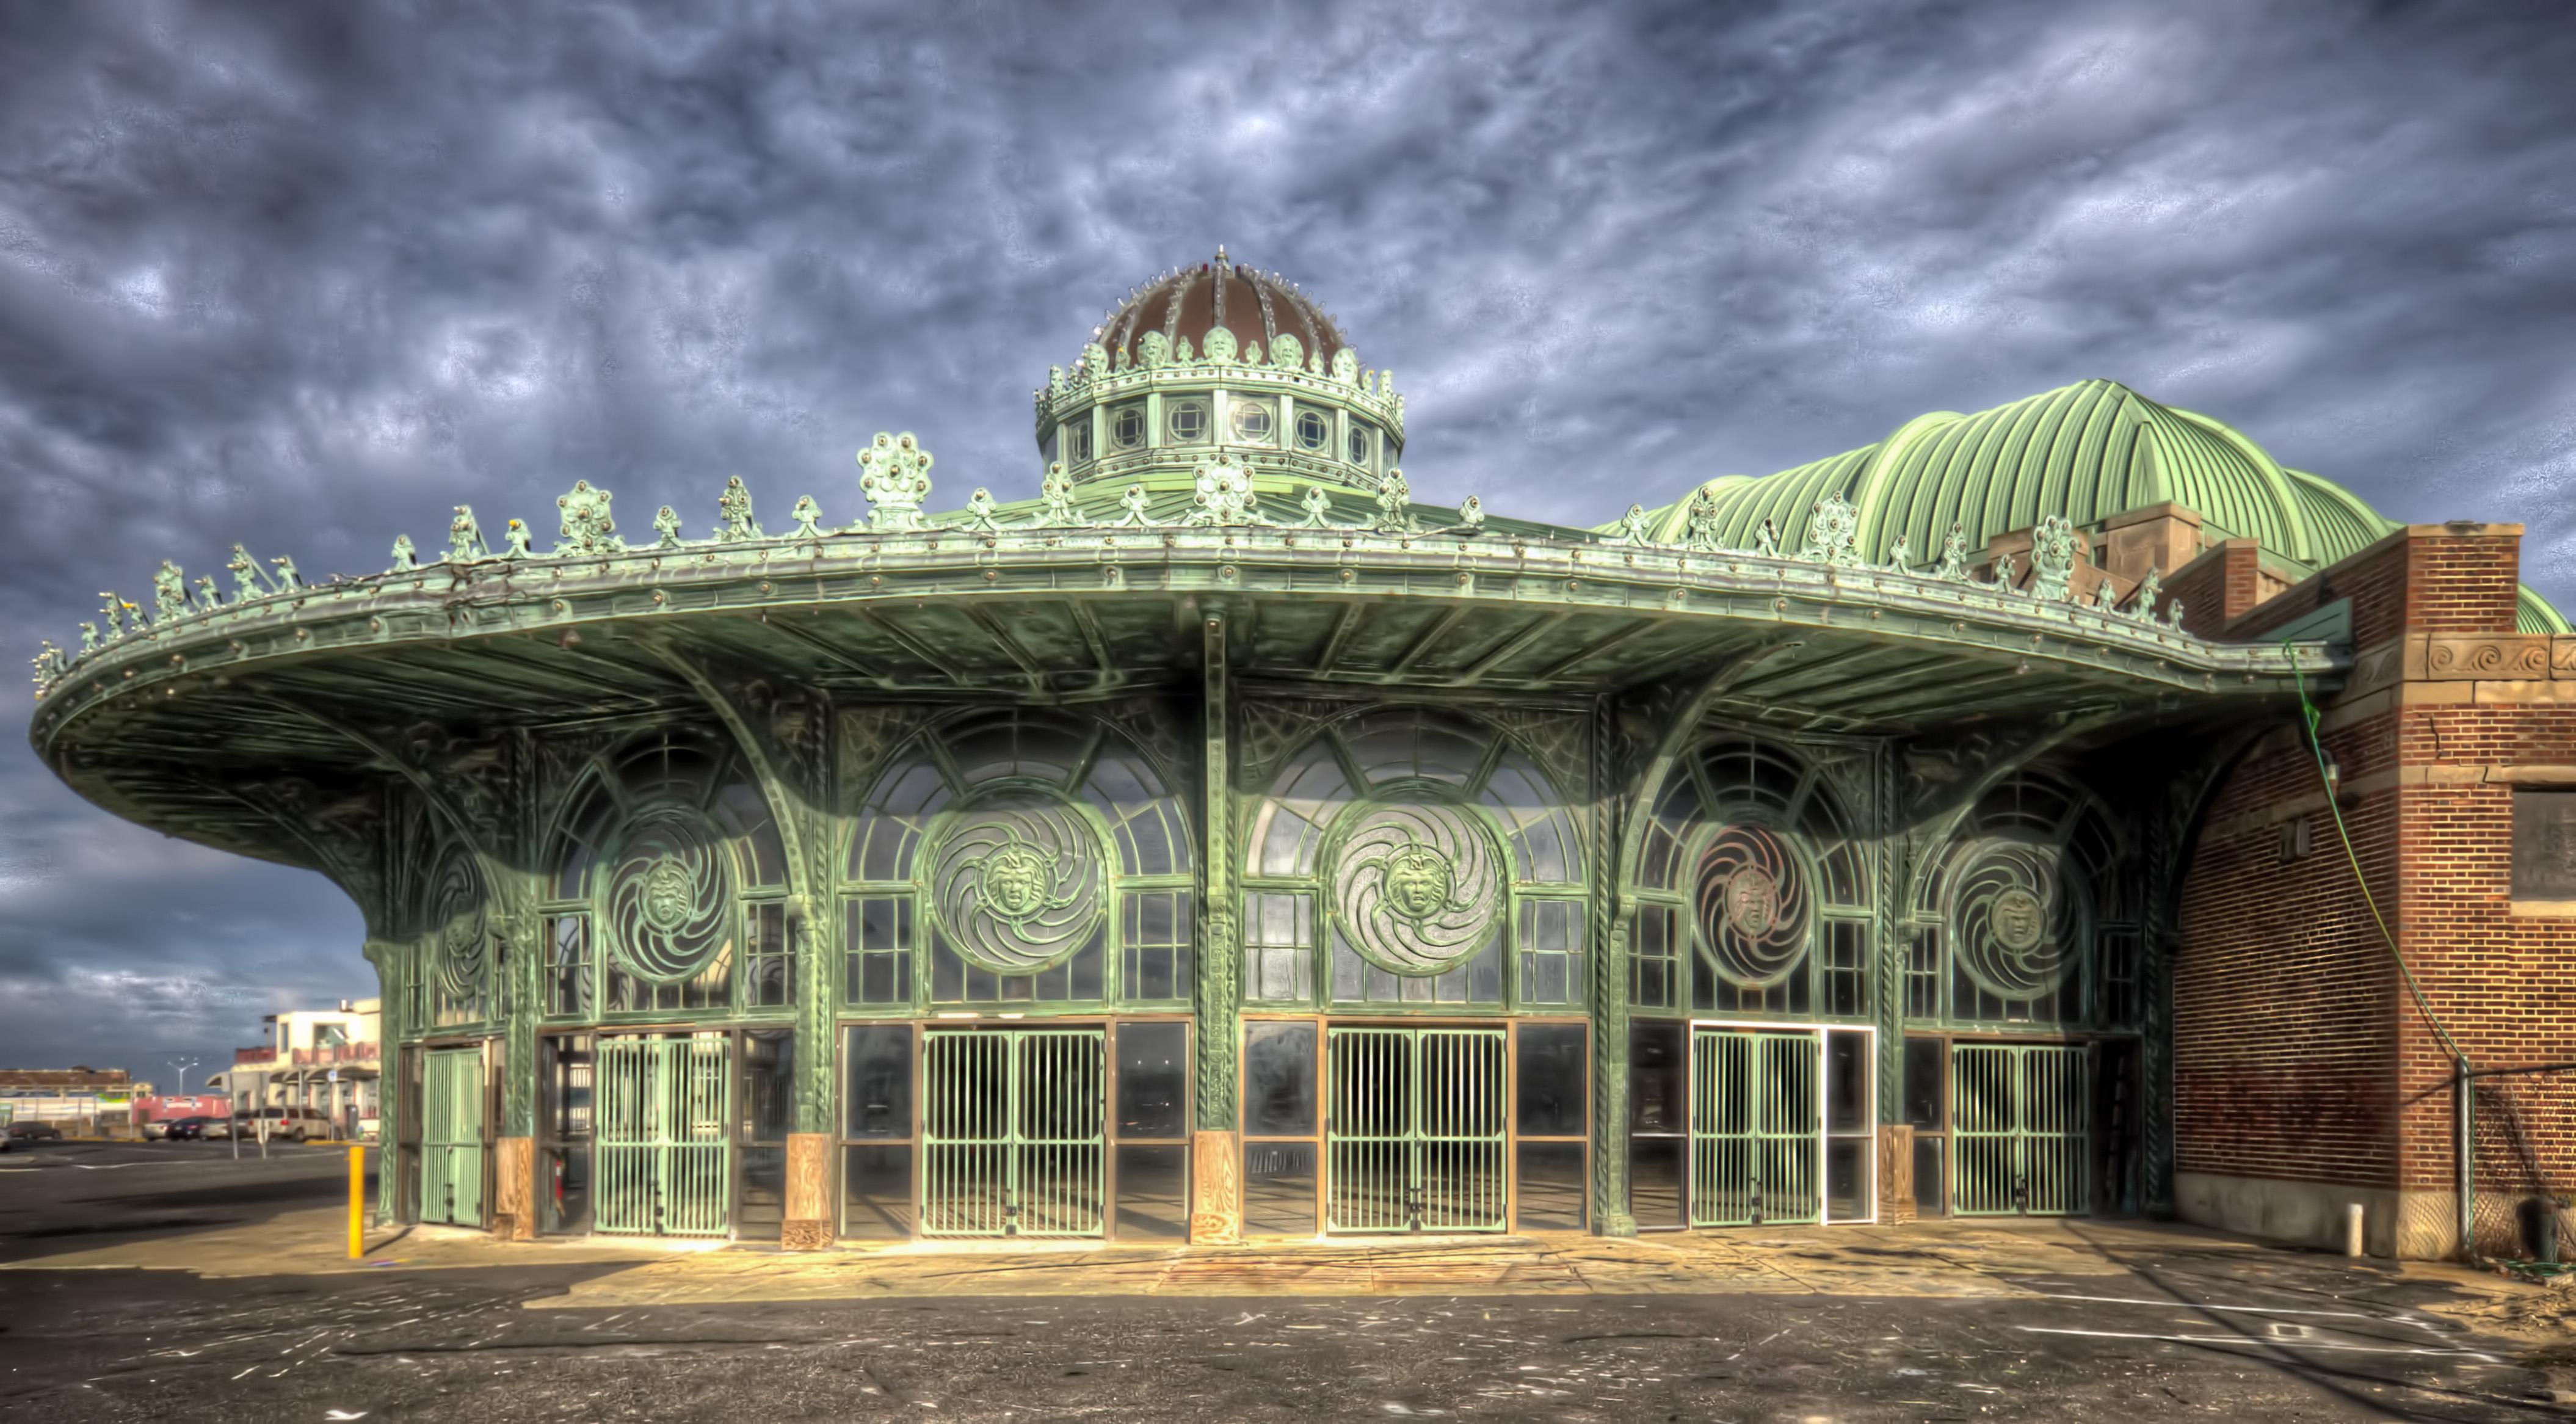 Carousel Room at the Asbury Park Casino.